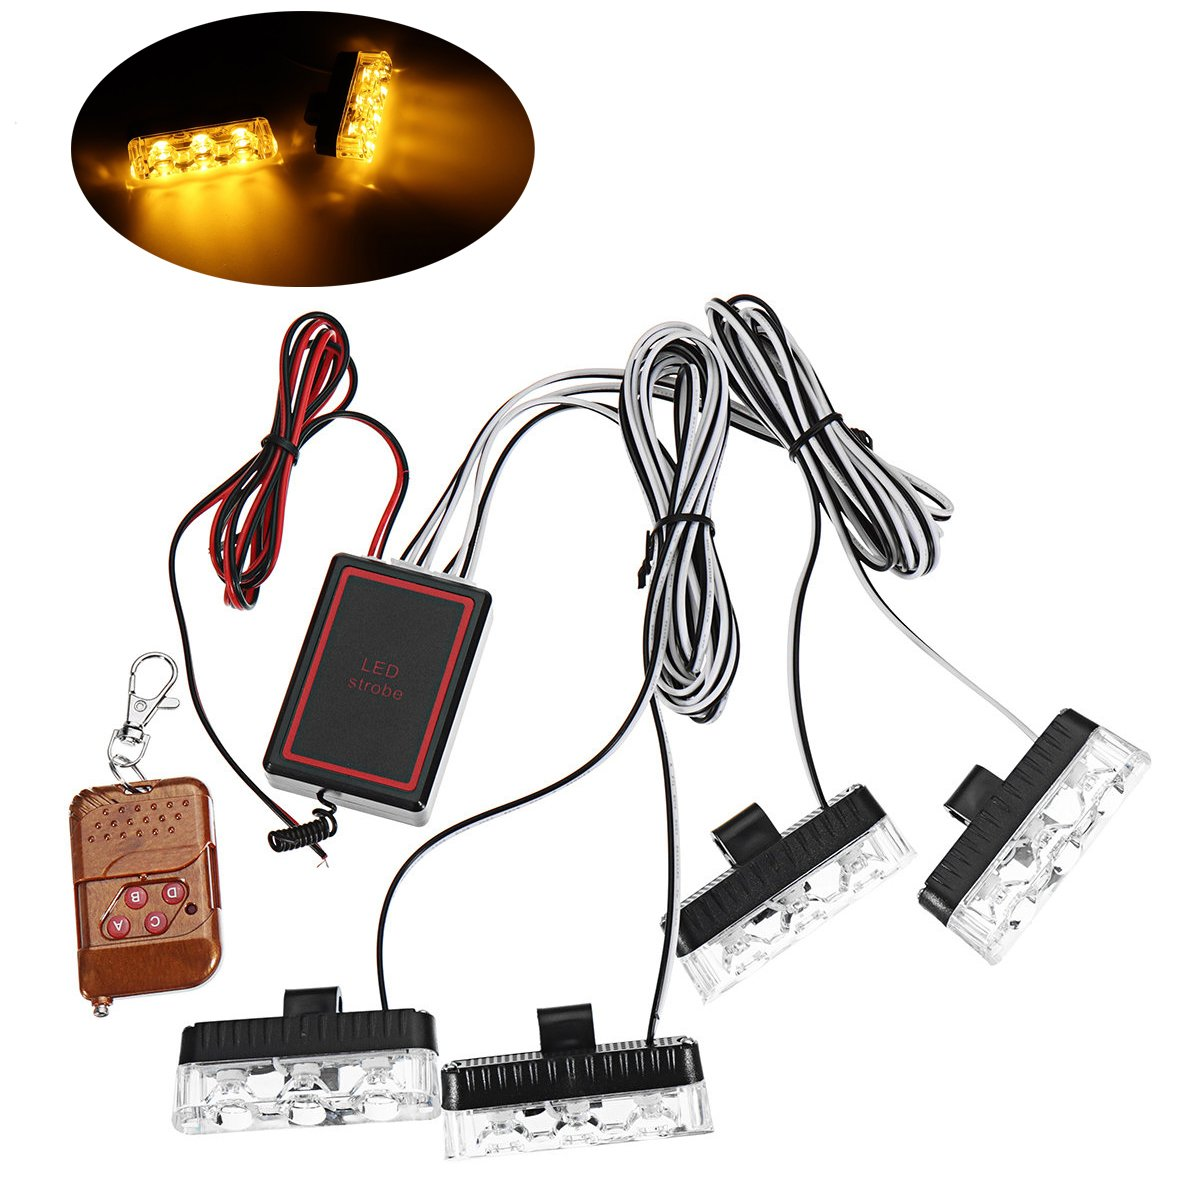 Amber HEHEMM 16 led Car Truck Emergency Lamp Flashing Lights DC 12V Universal Strobe Light Warning Light with Wireless Remote